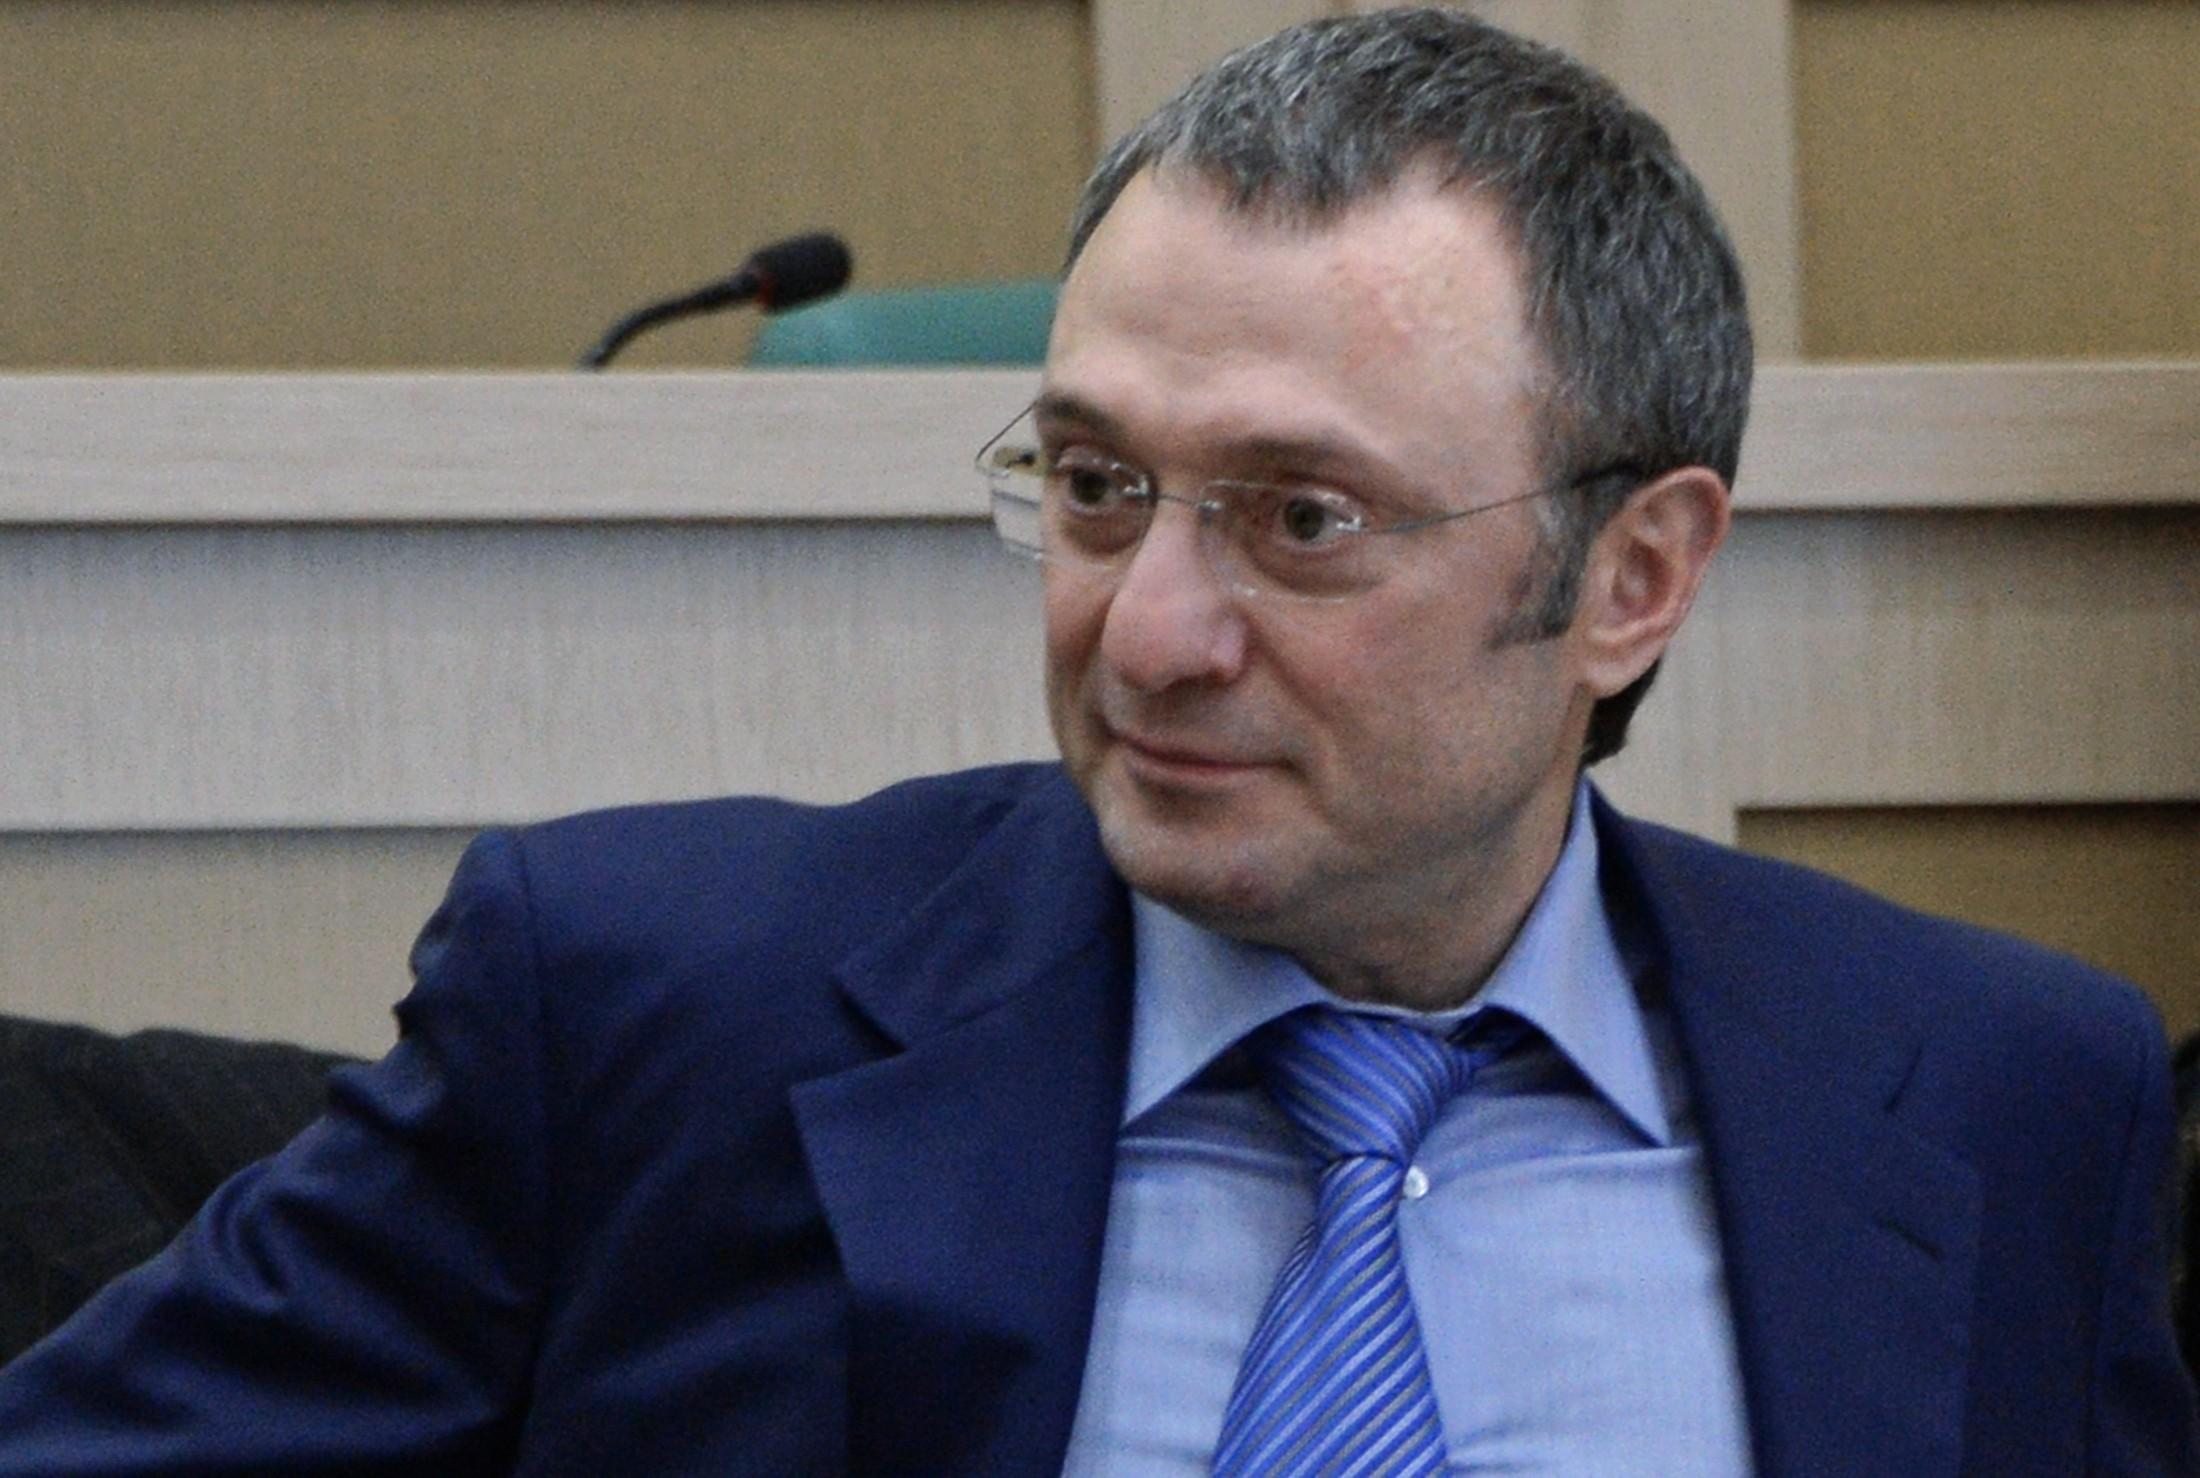 <p>Сенатор Сулейман Керимов. Фото: &copy; РИА Новости/Владимир Федоренко</p>